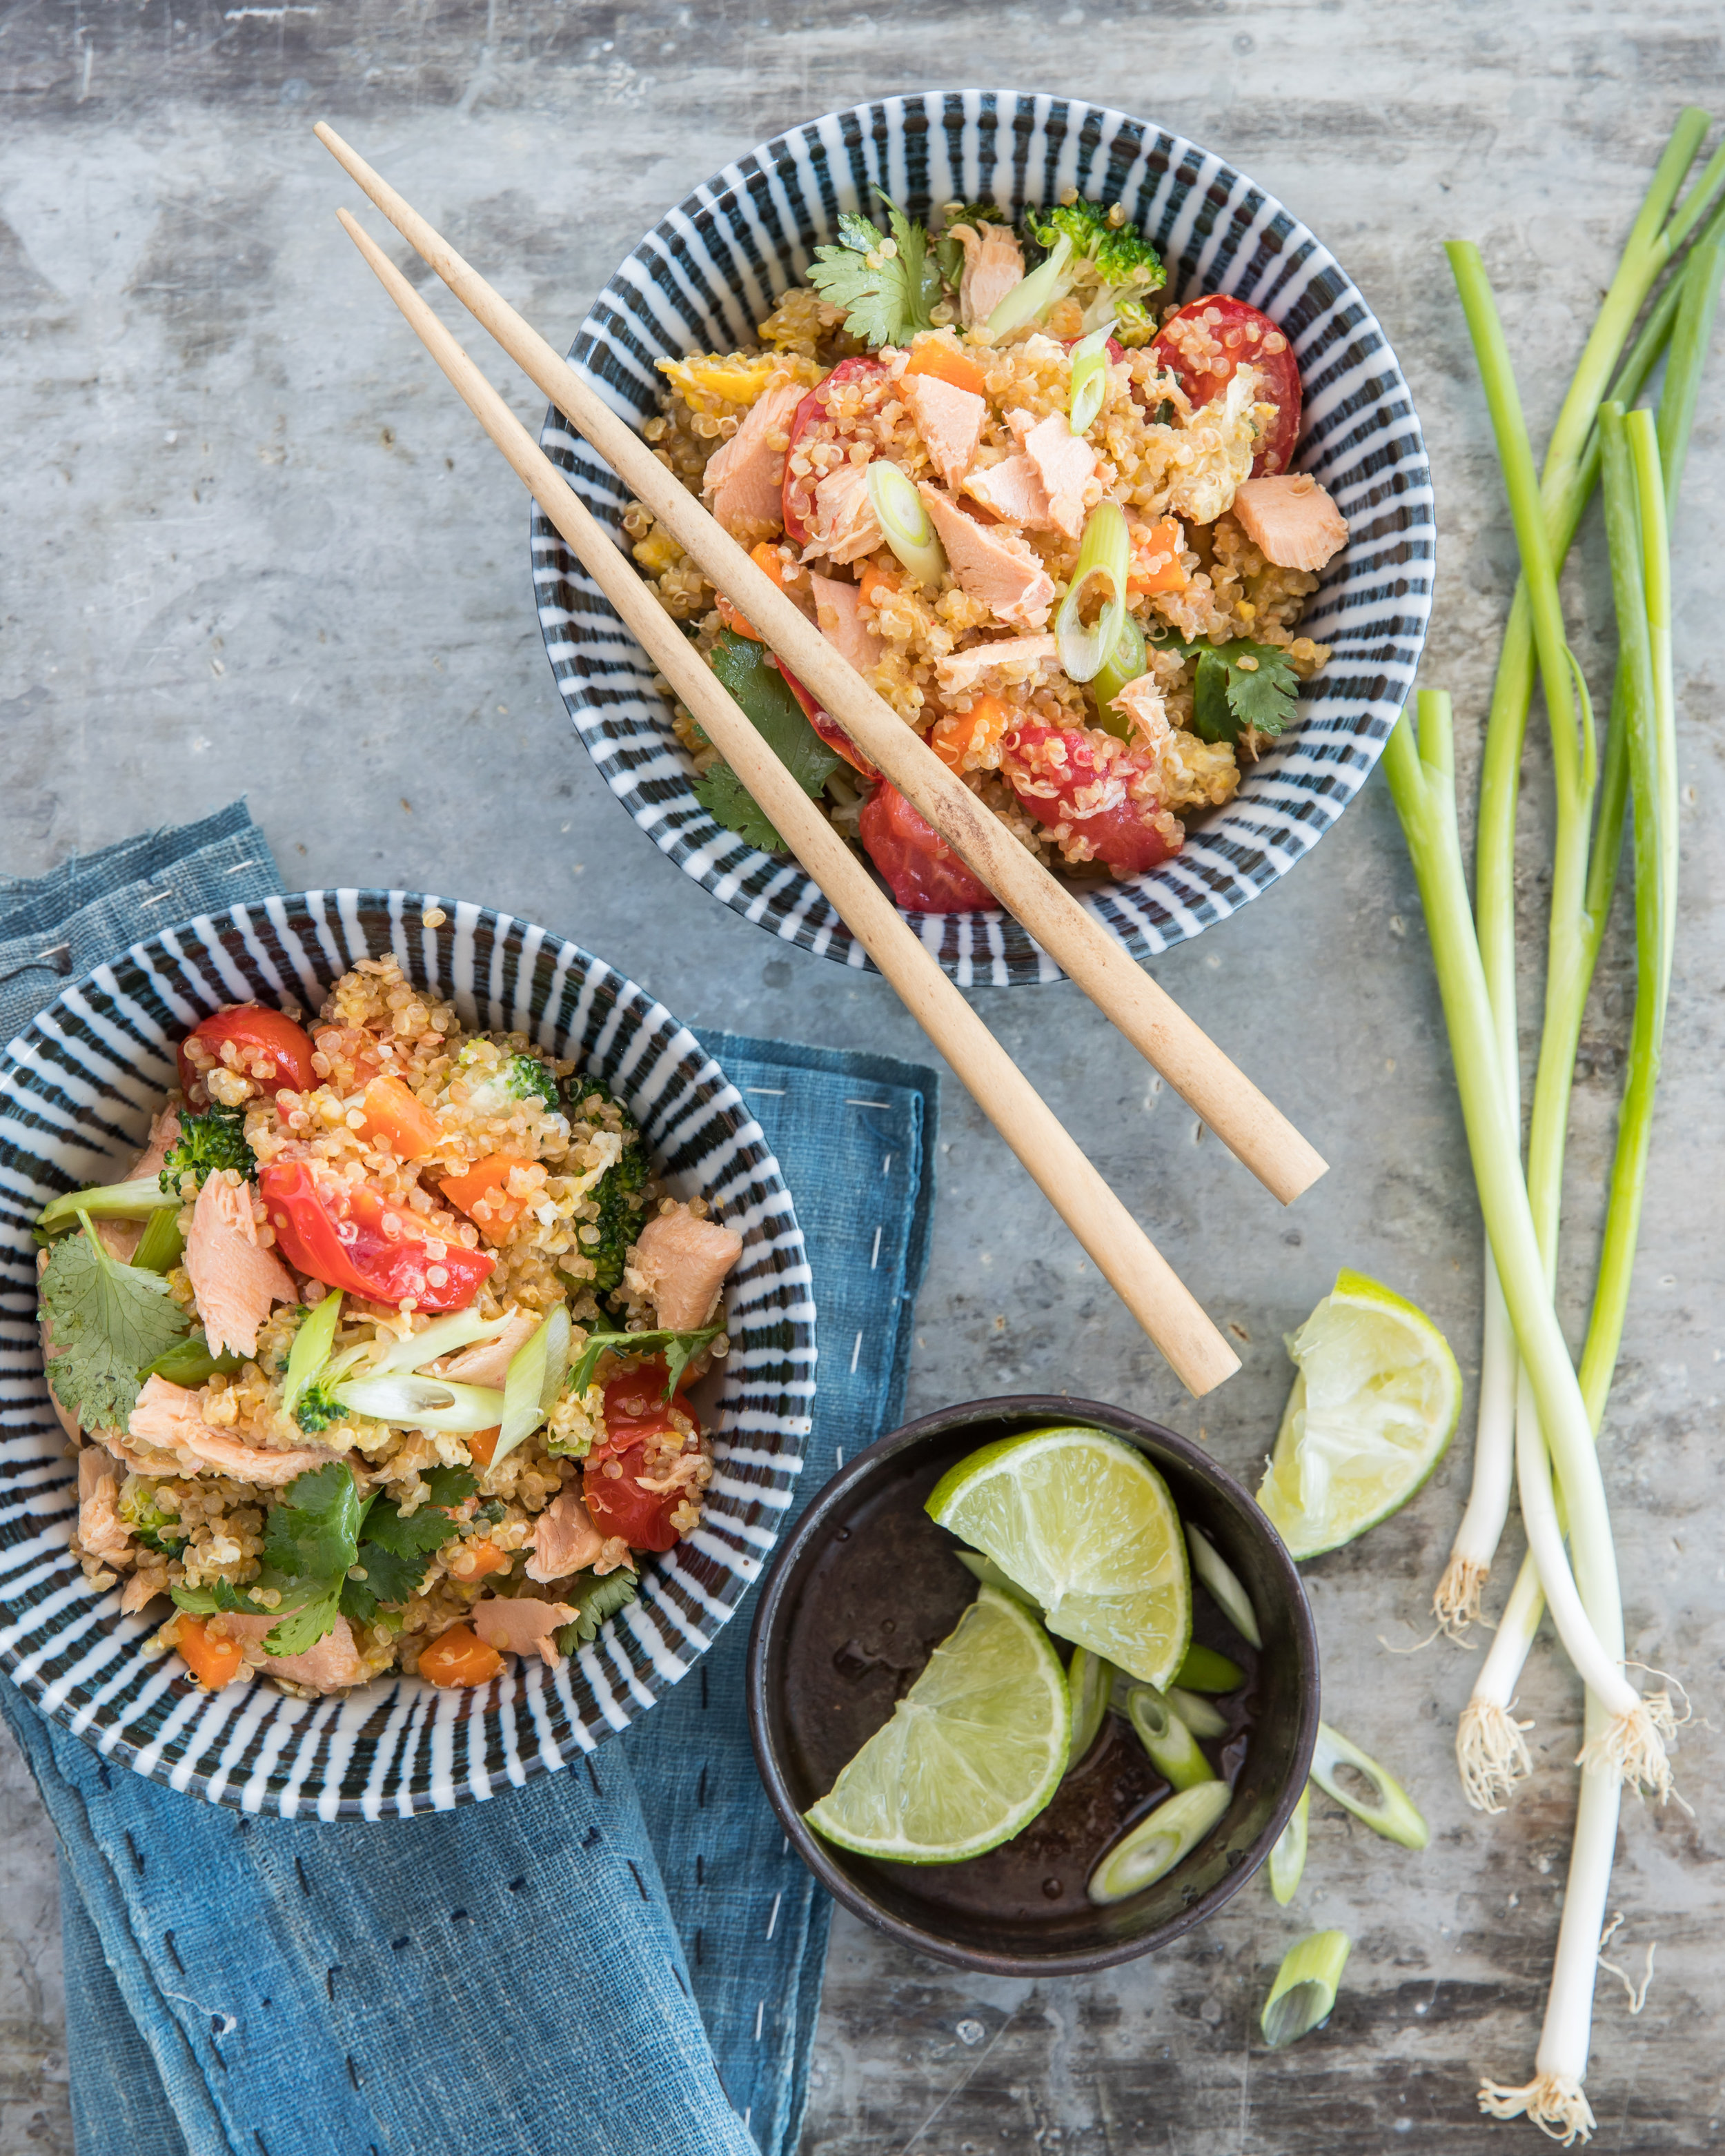 Fried Olive Green Organics quinoa 'rice' with Good Fish salmon